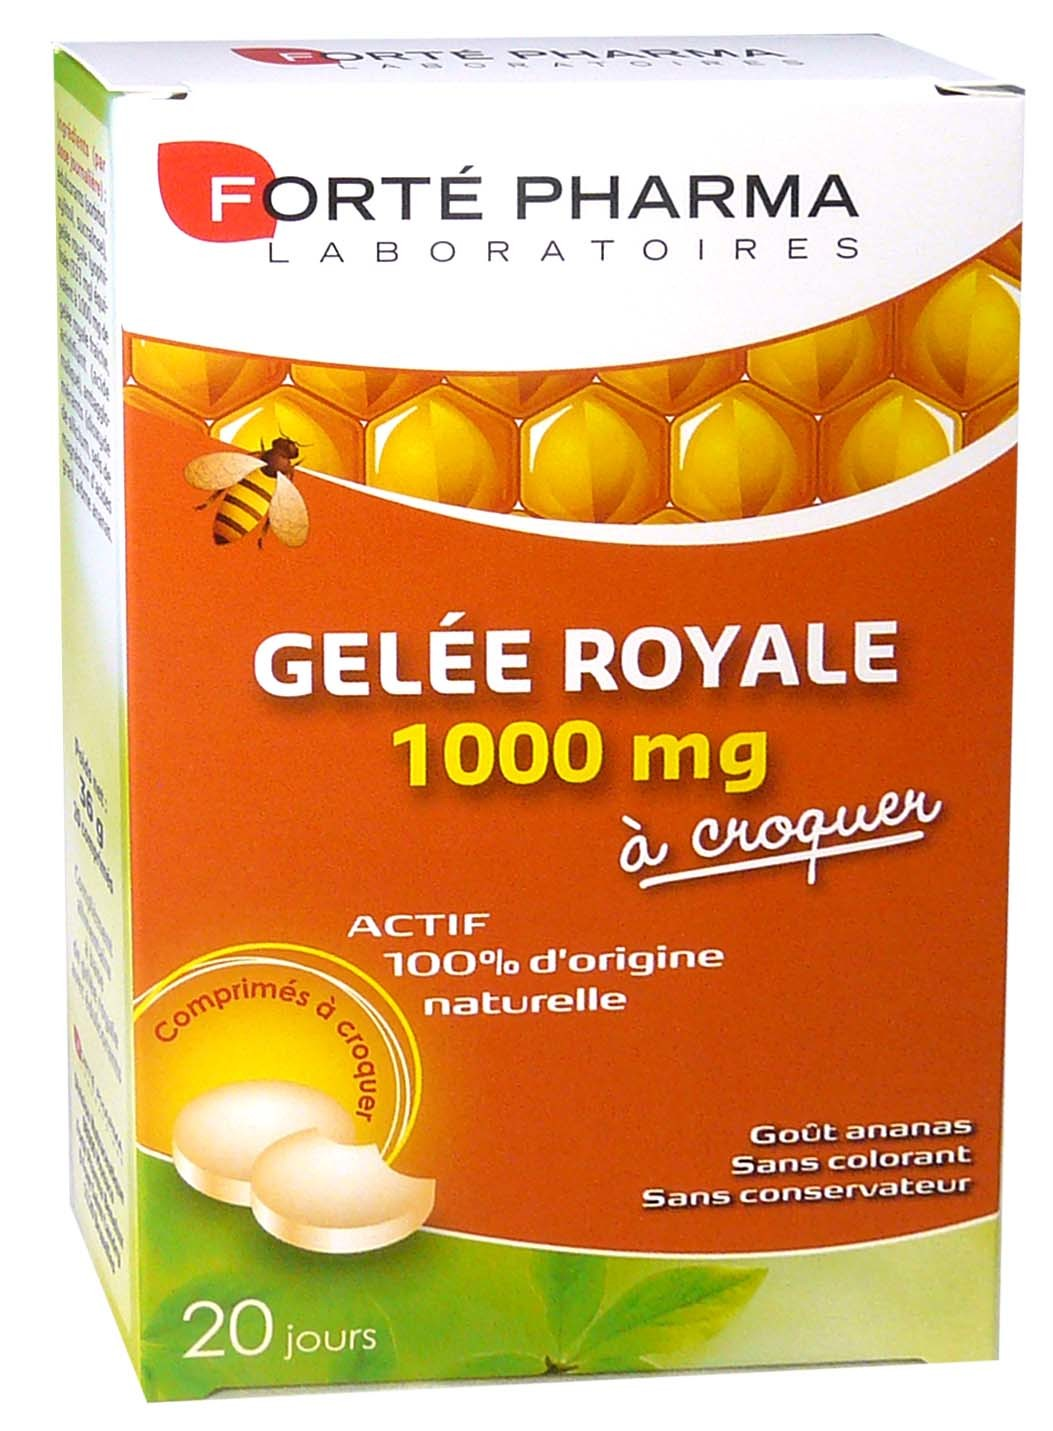 forte-pharma-gelee-royale